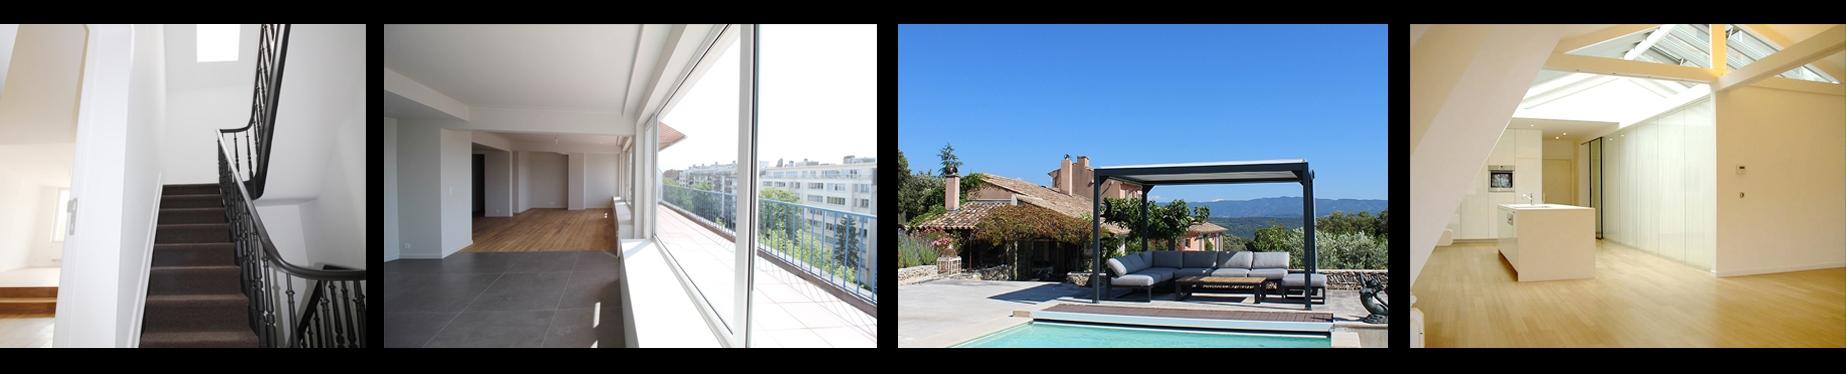 cosyhomes-bandeau-photos-homepage